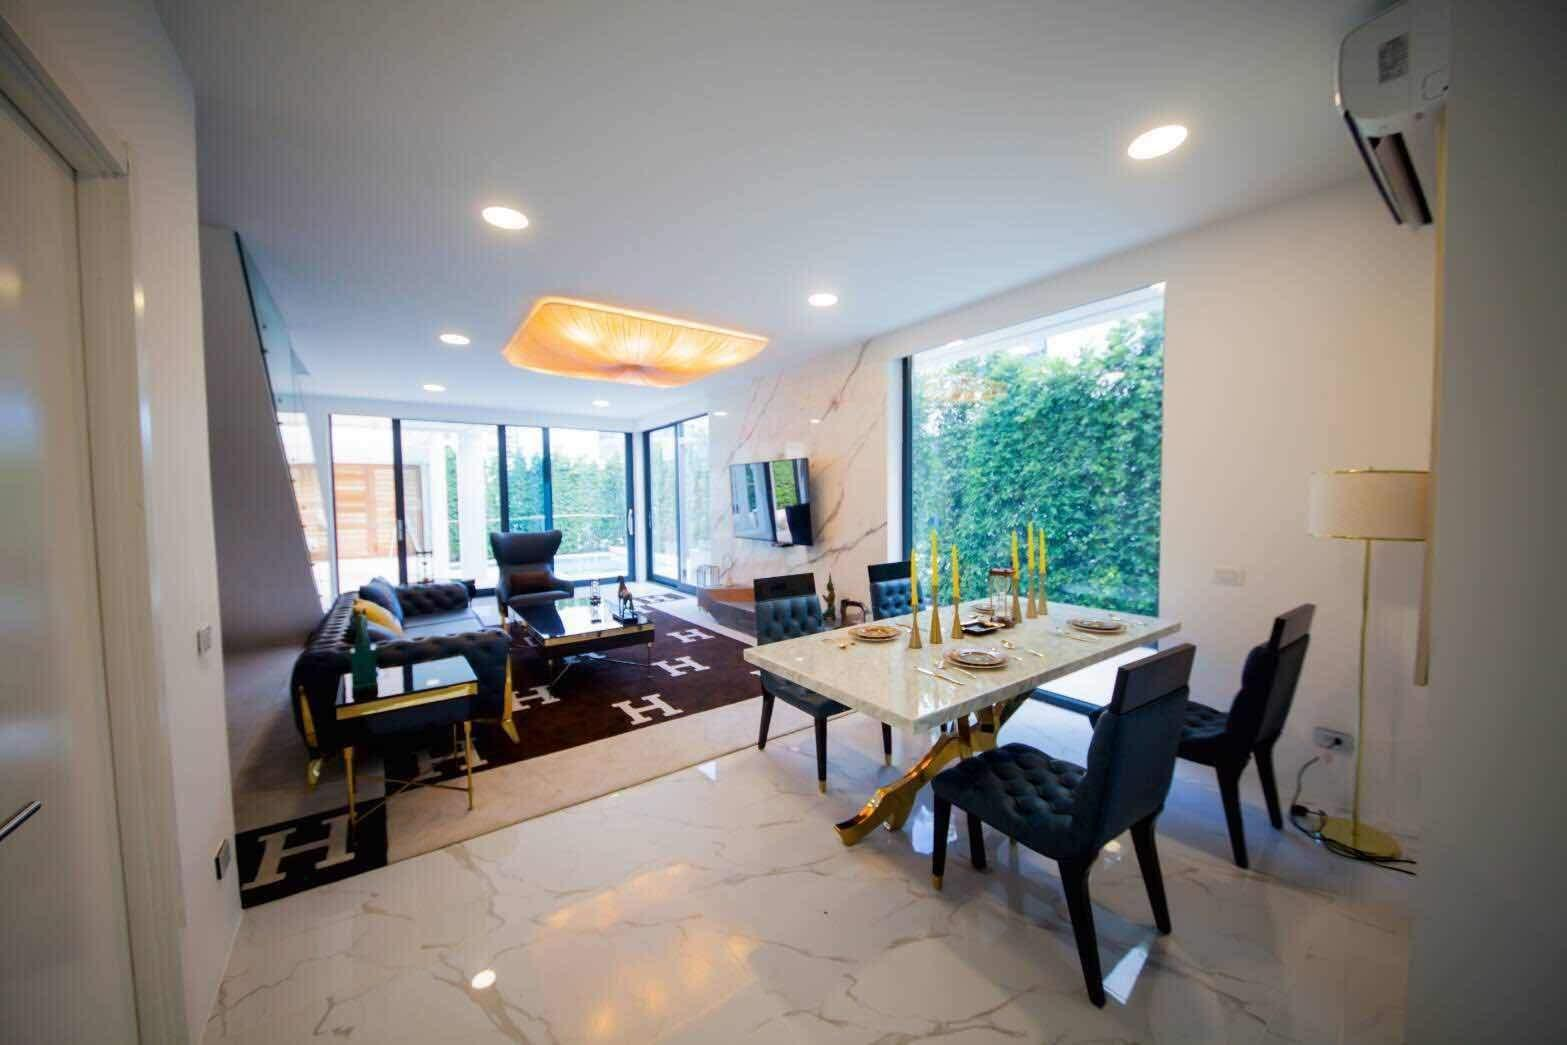 7 Bedrooms Double Pool Luxury Villa